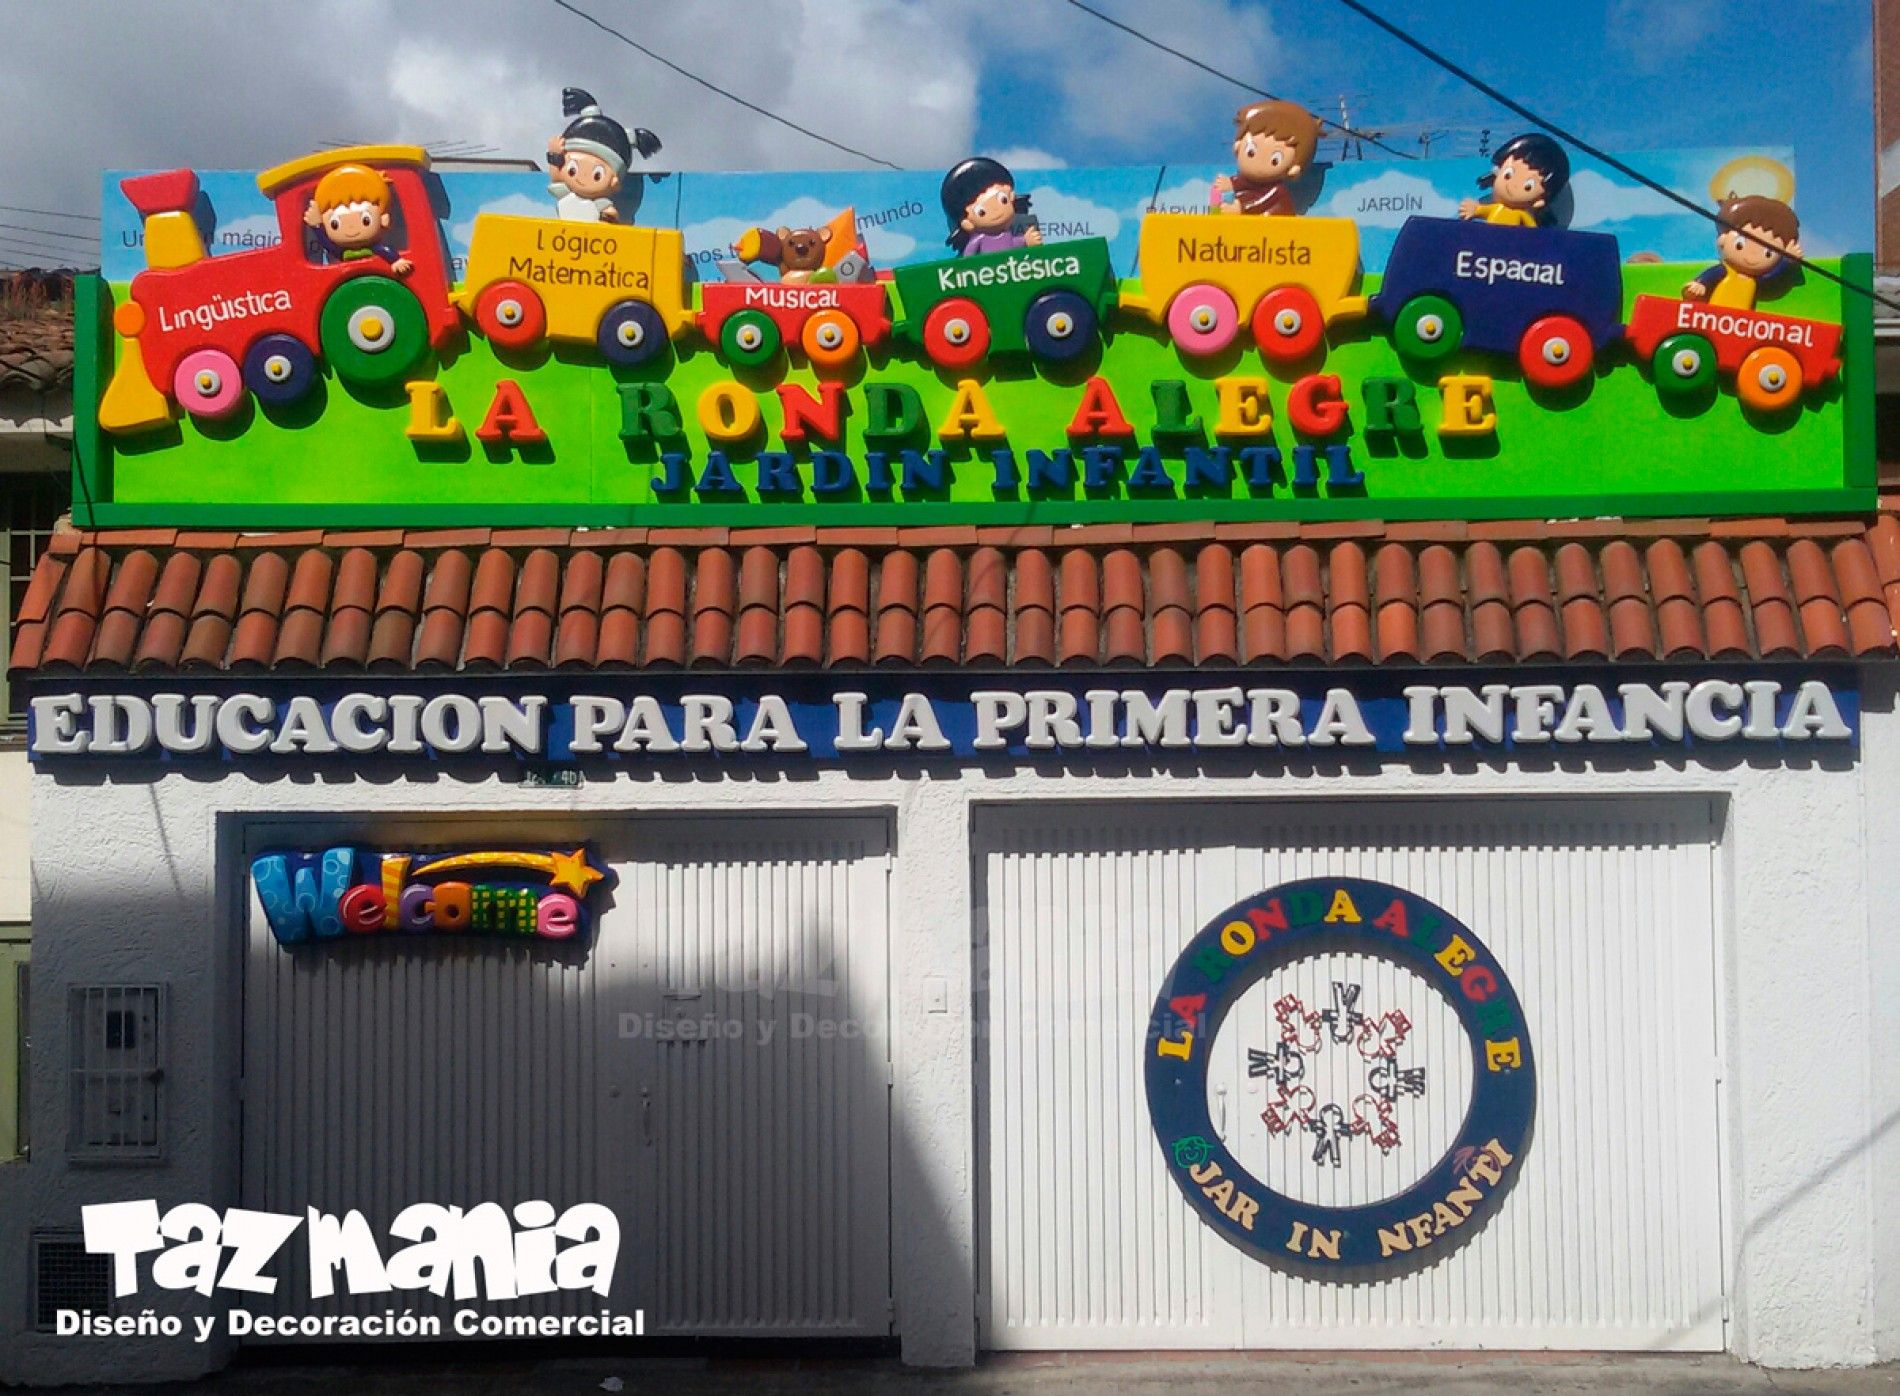 Tazmania Dise O Y Decoraci N Comercial Ecole Amen2 Pinterest  # Muebles Safari Bucaramanga